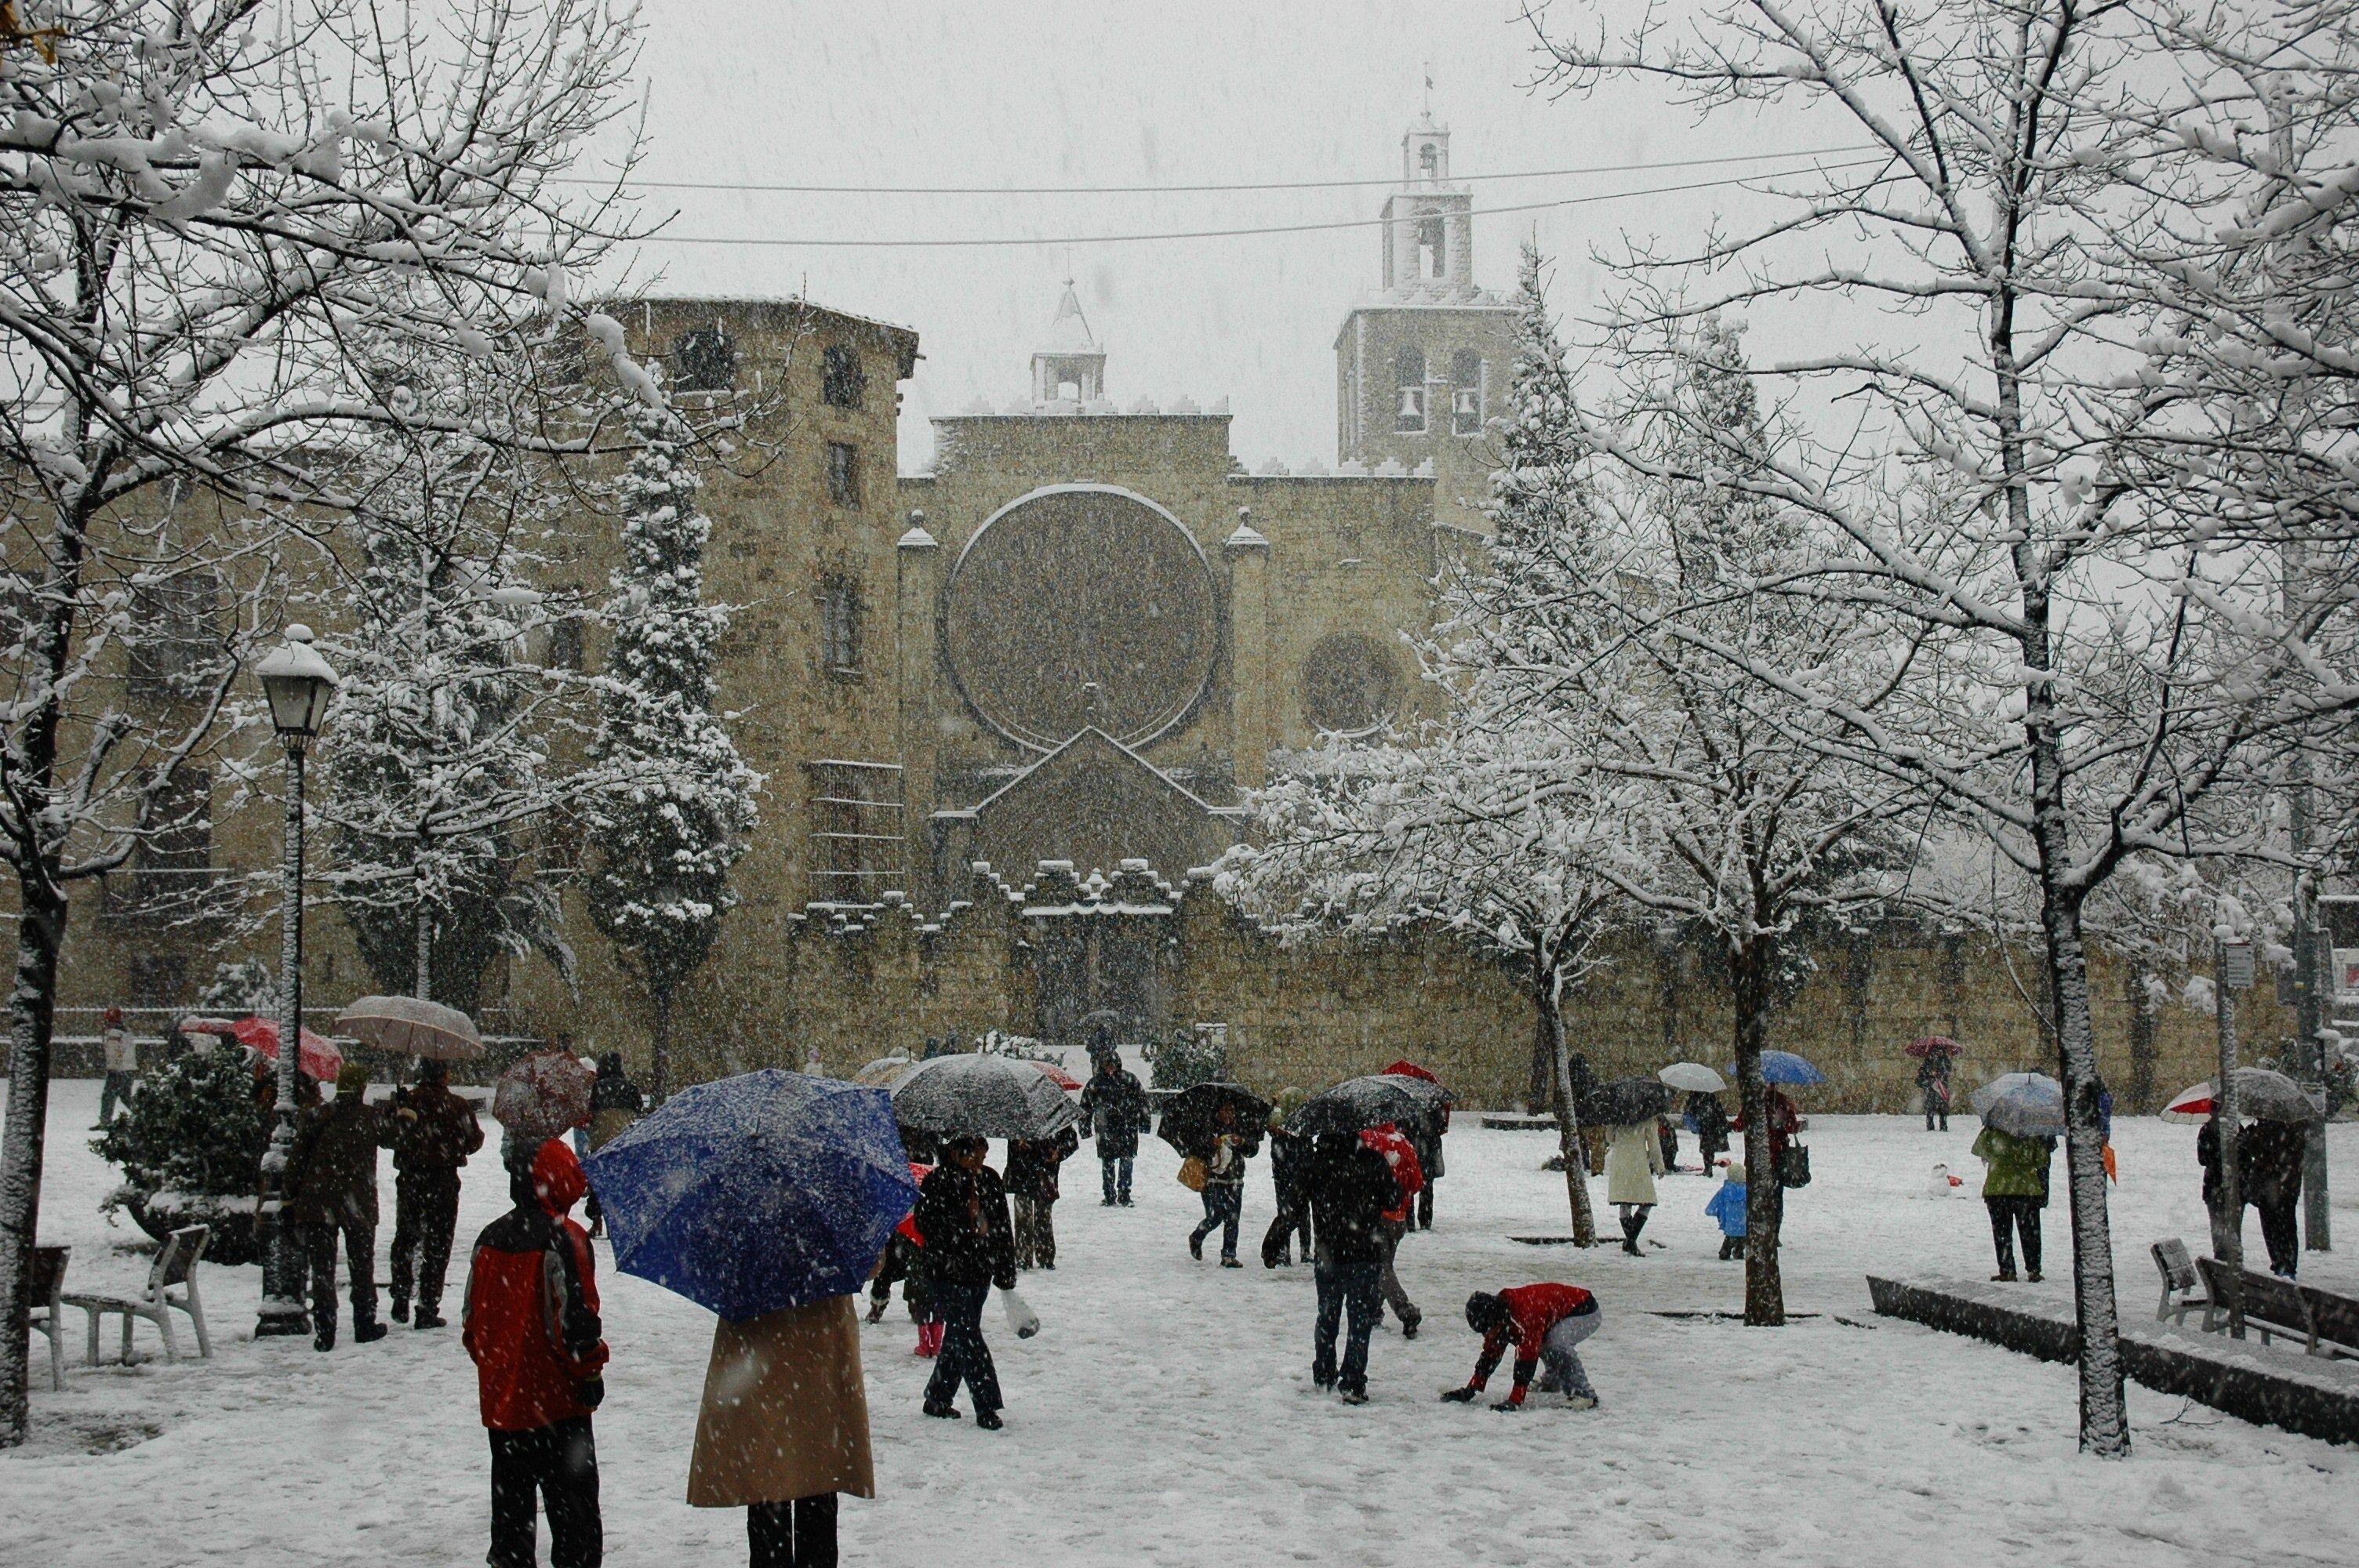 Sant cugat fitxer sant cugat nevada 2010 jpg - Placa barcelona sant cugat ...